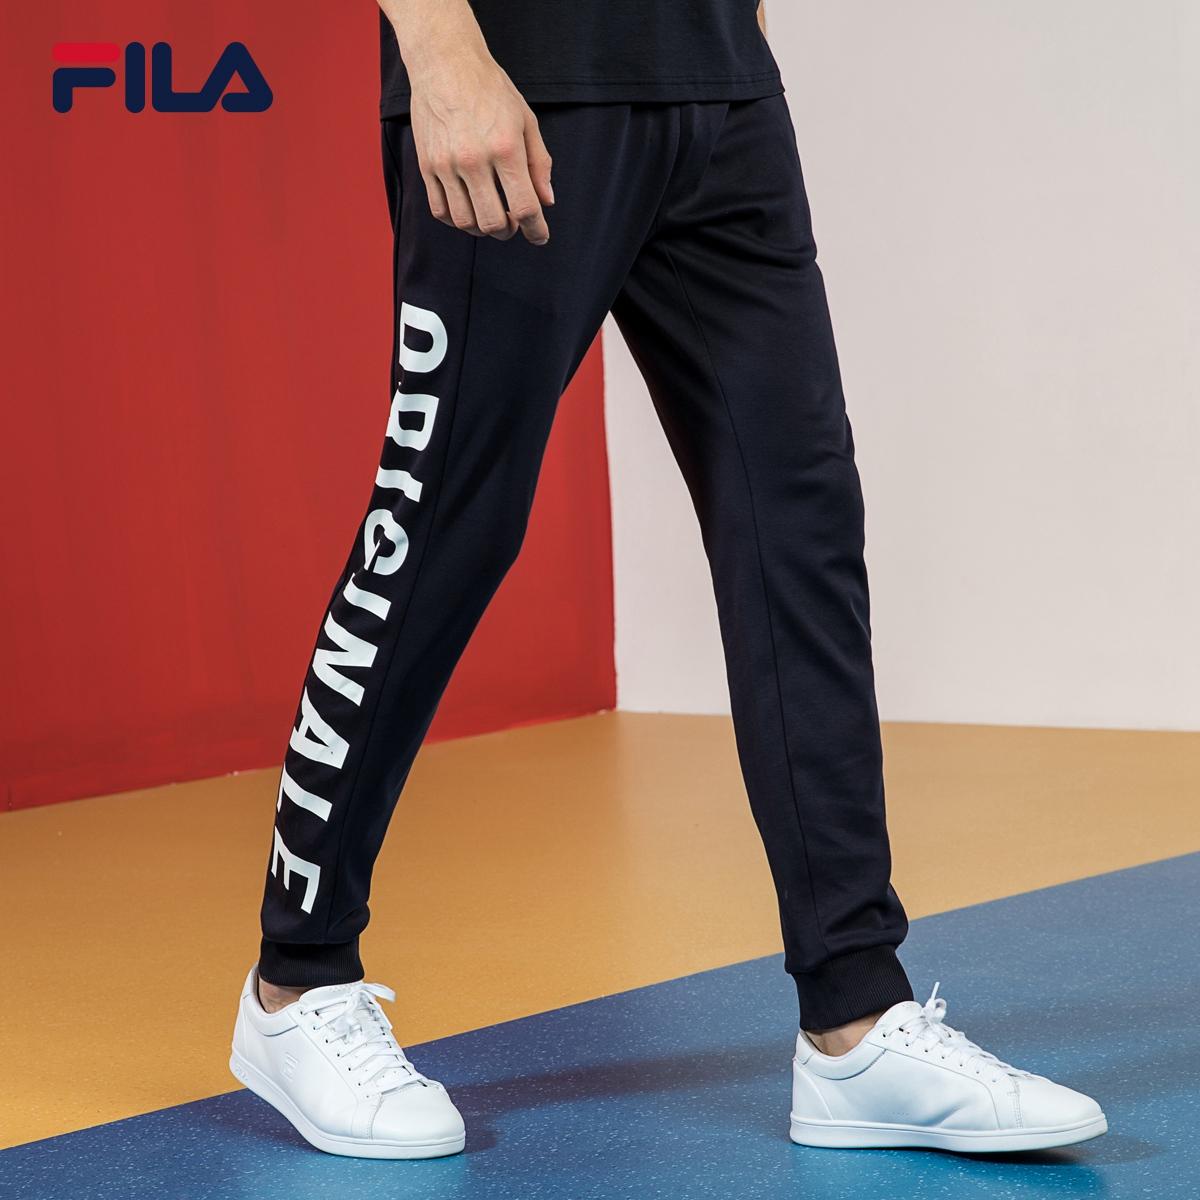 FILA斐乐男士长裤2018新品收口长裤带LOGO潮流时尚跑步运动裤男